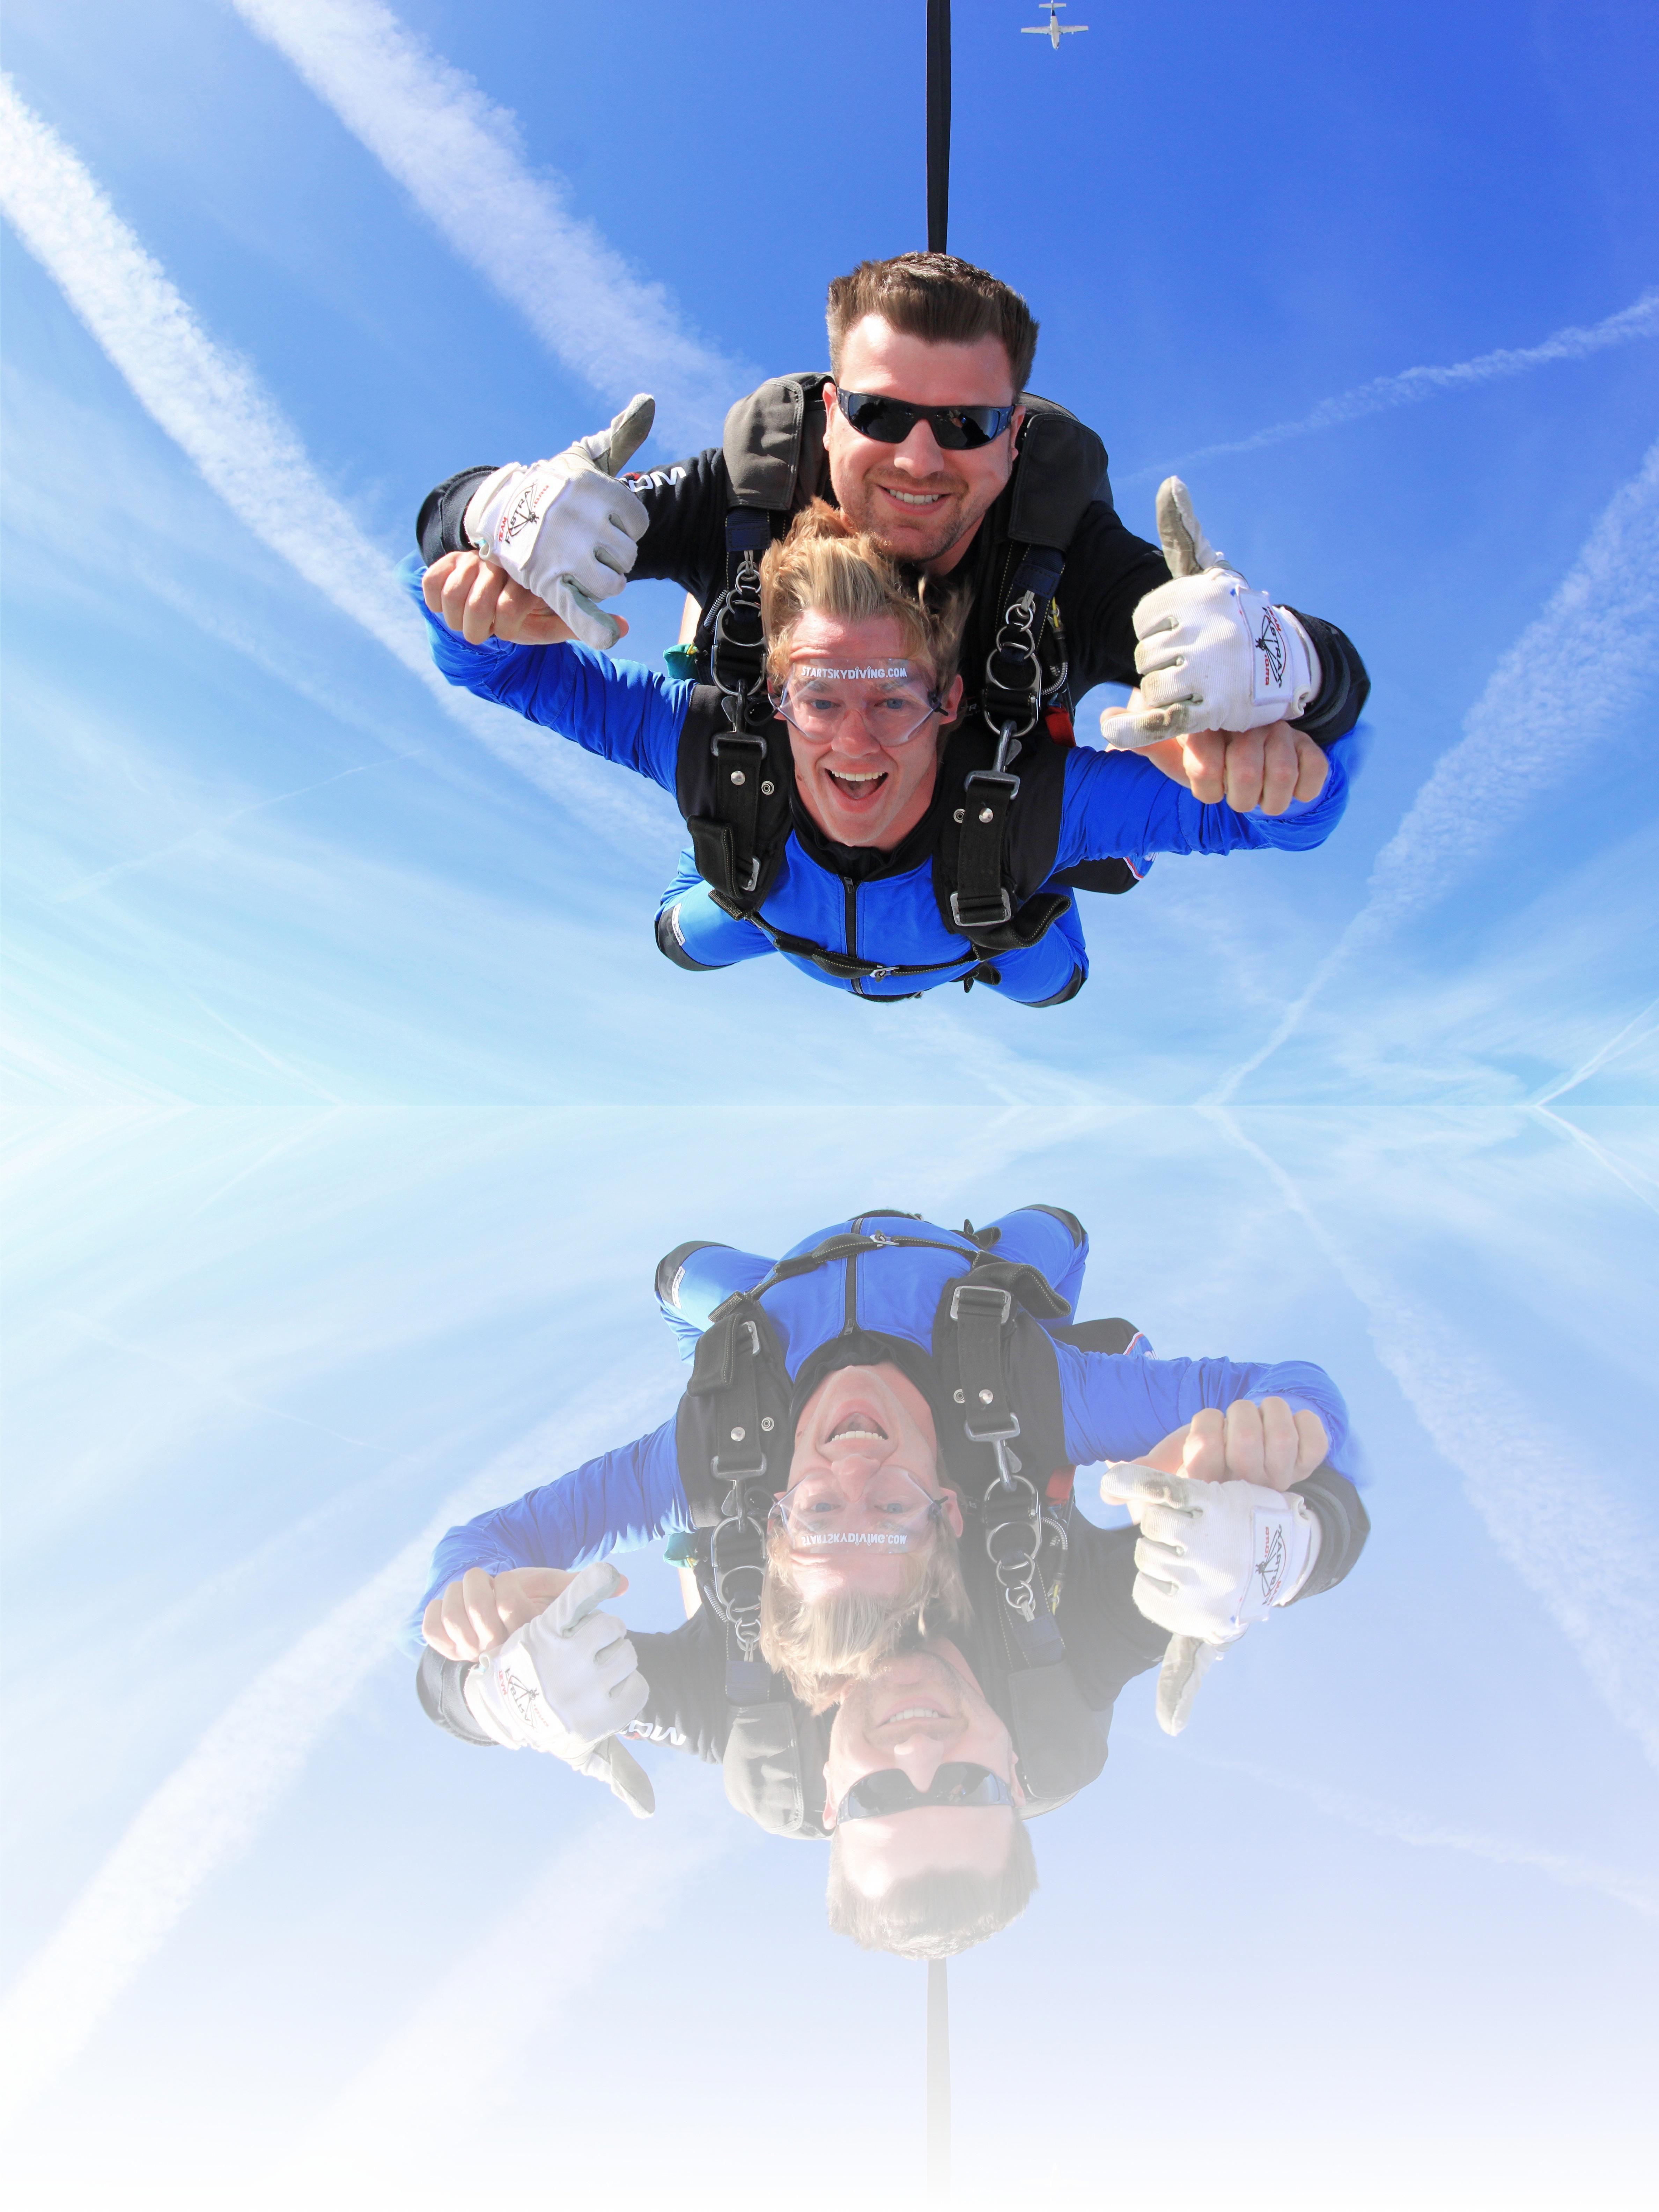 The Feeling Of Tandem Skydiving Skydiving Diving Tandem